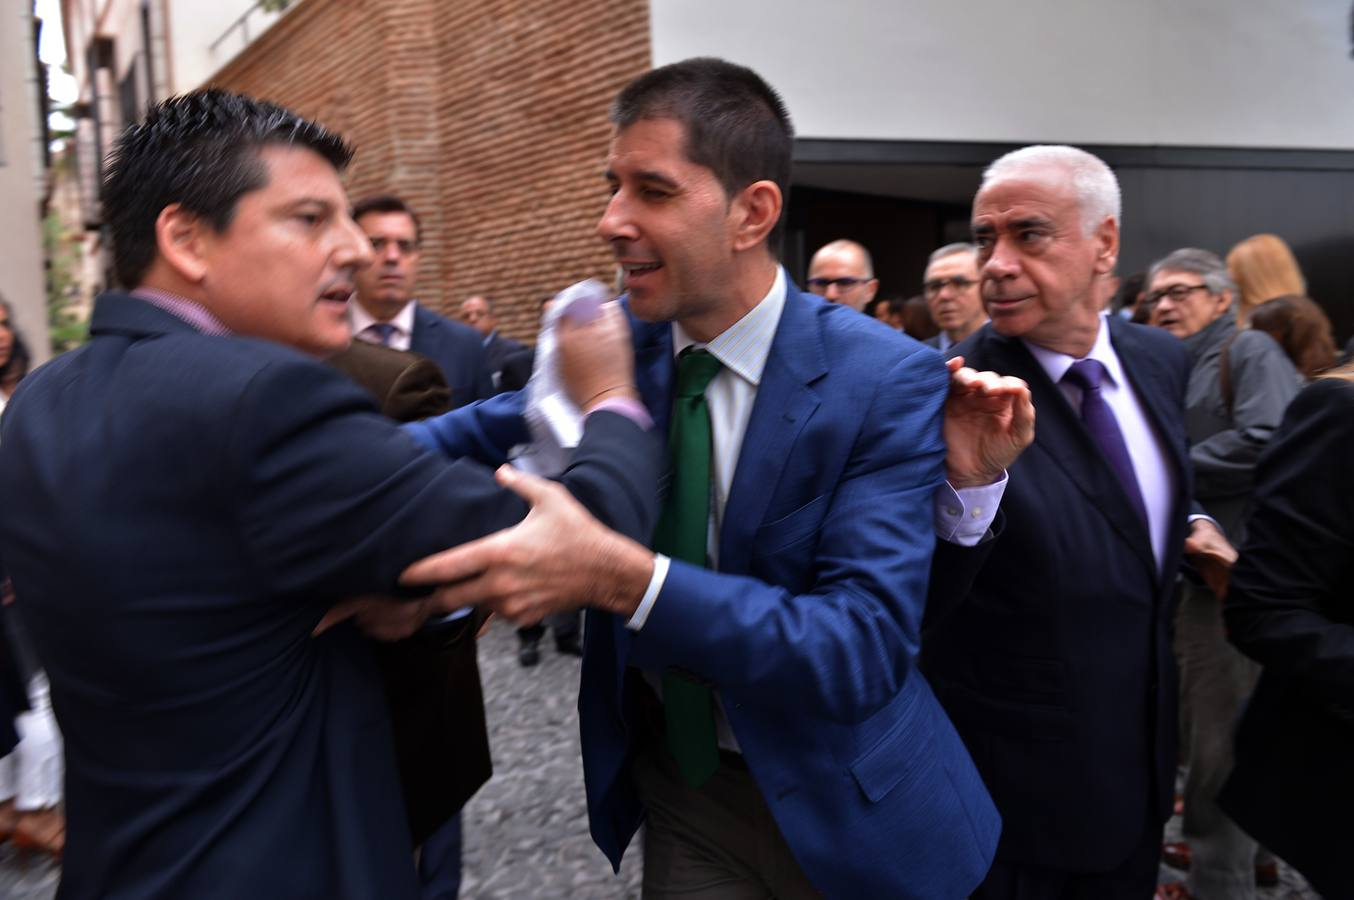 Alcaldes del PP pierden los papeles en un 'escrache' a Susana Díaz